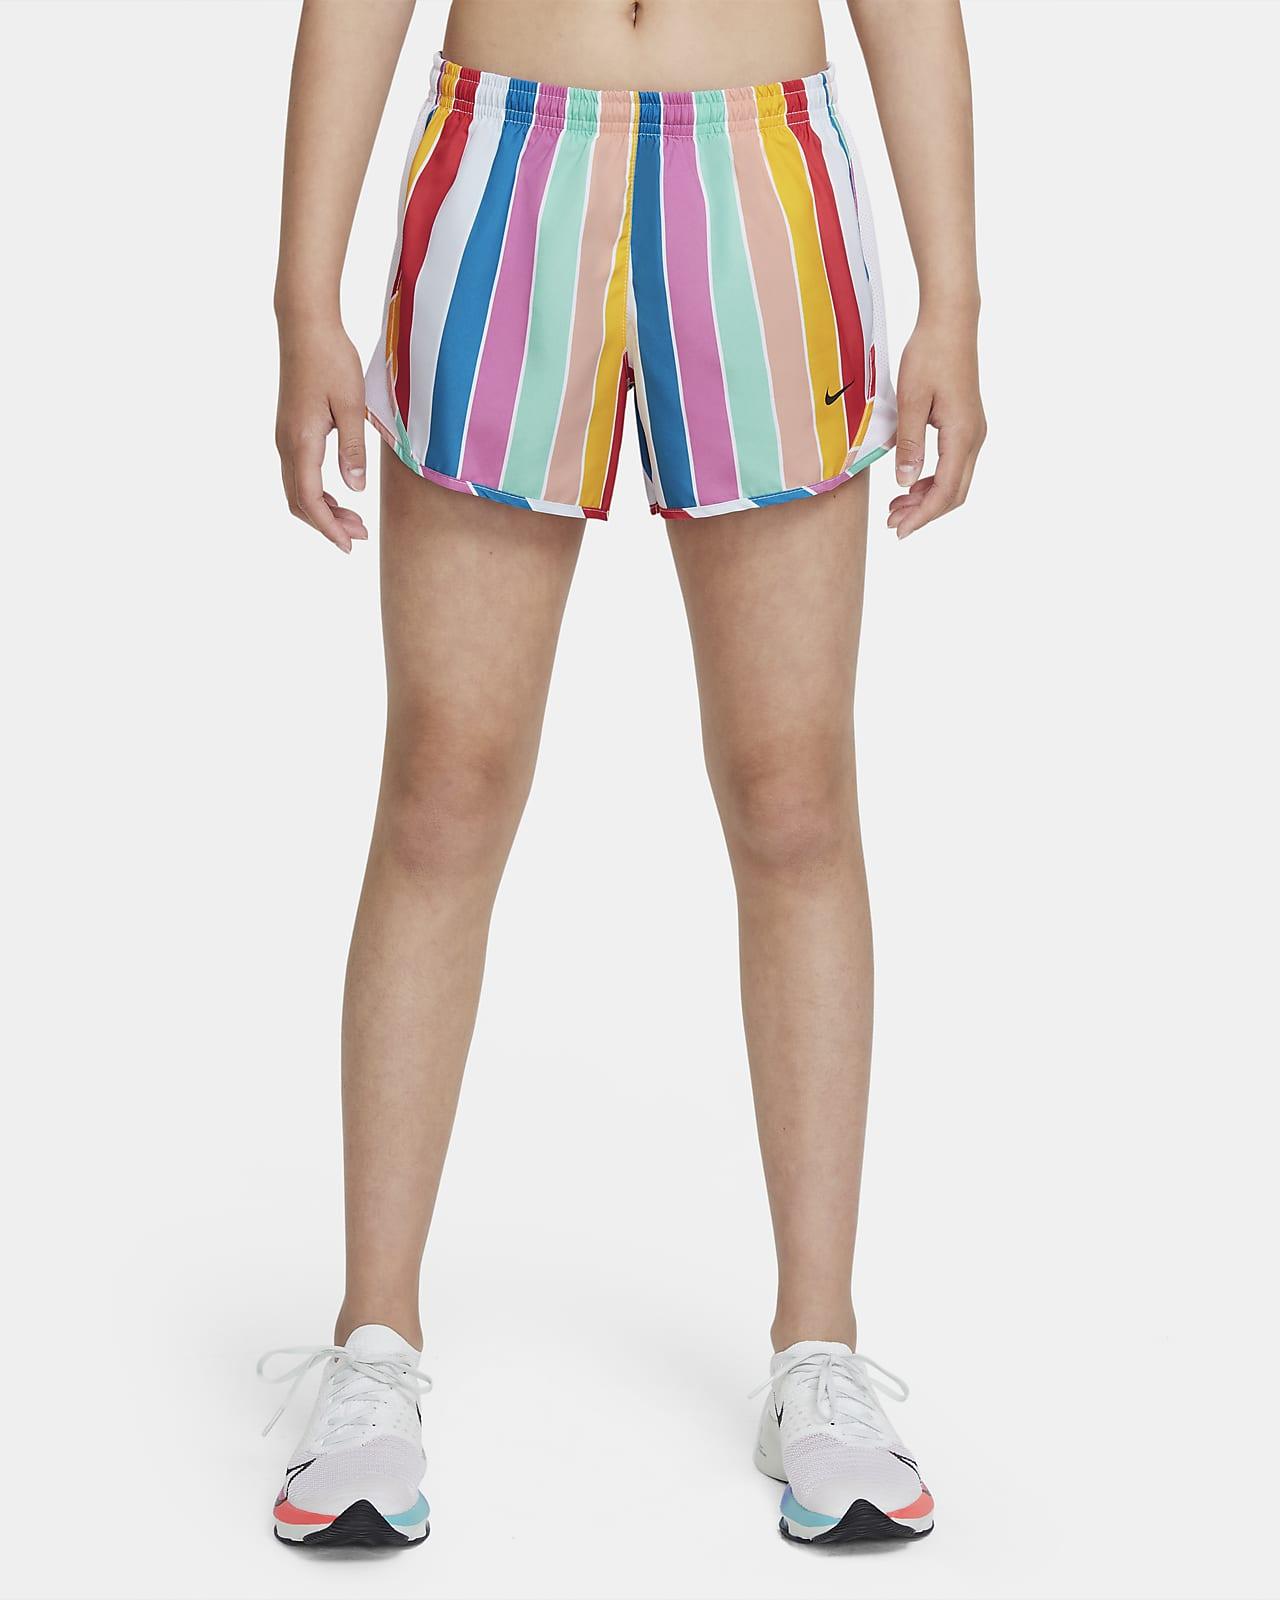 Nike Dri-FIT Tempo Big Kids' (Girls') Striped Running Shorts